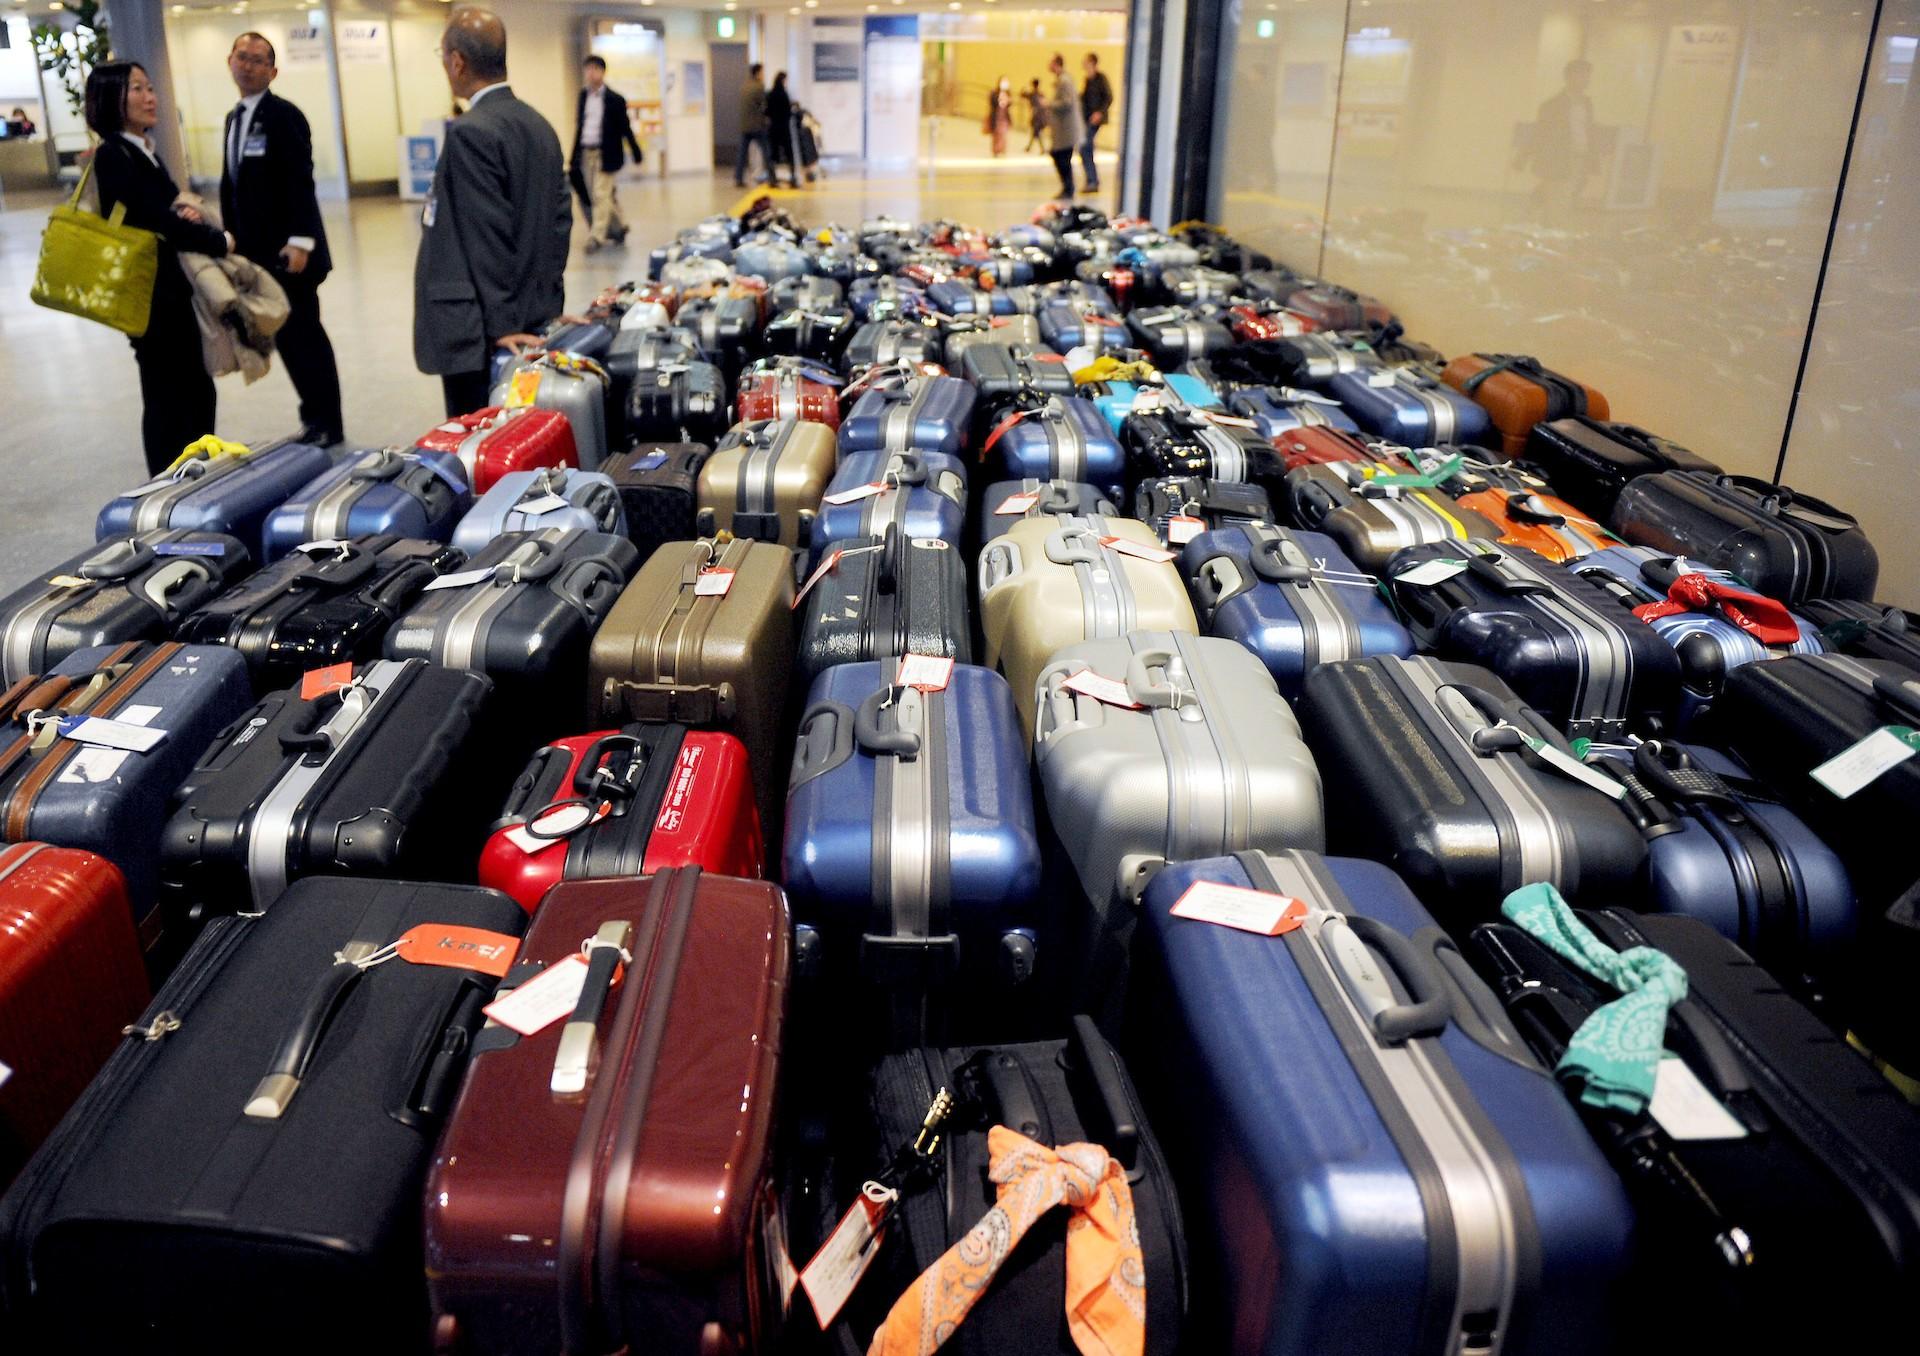 Multa Profeco con 22.4 mdp a aerolíneas por cobro indebido de maletas